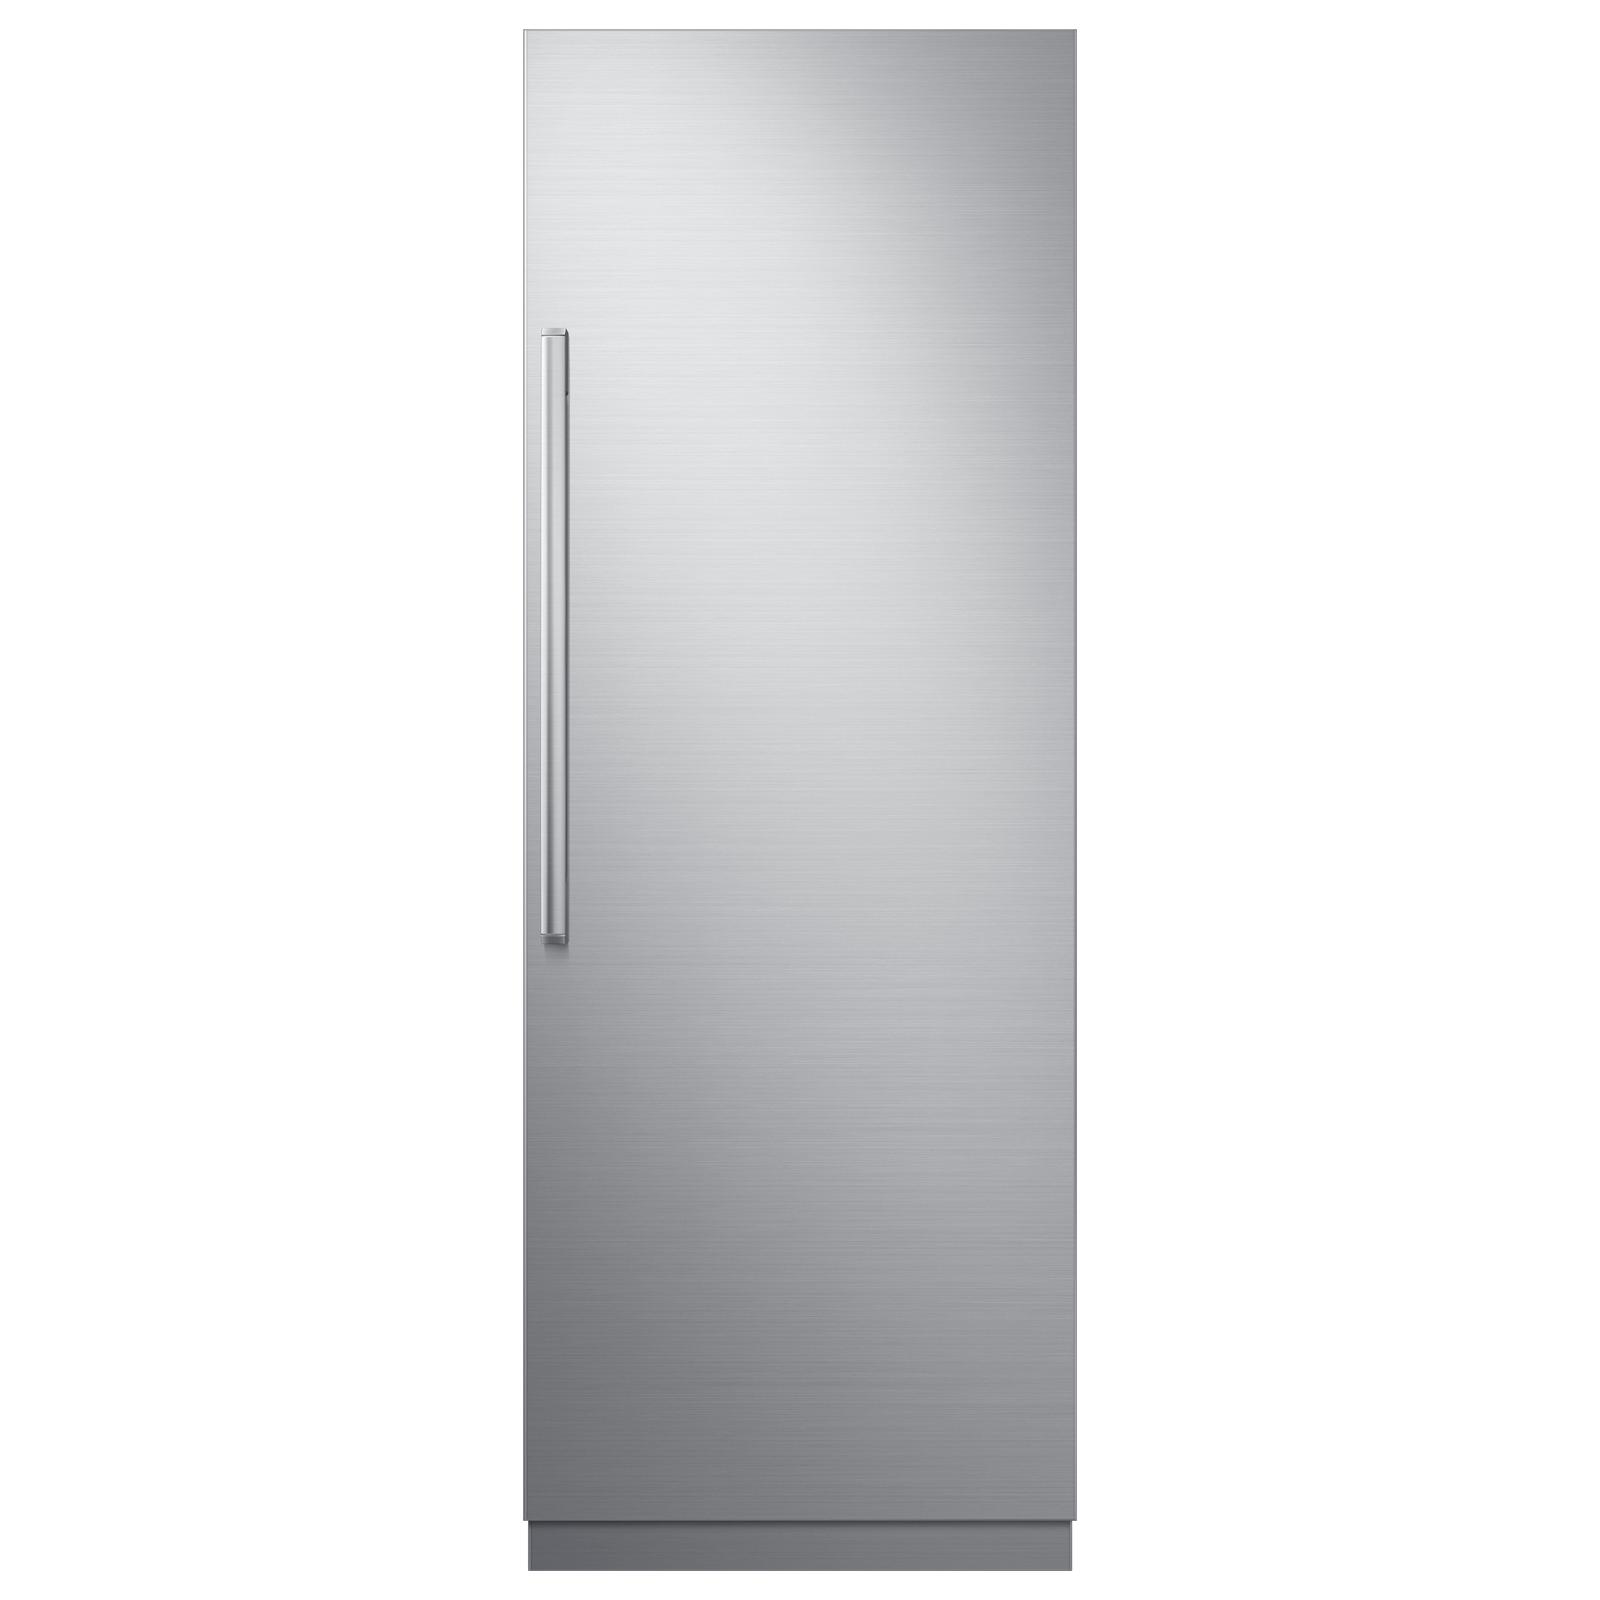 "Model: DRZ30980RAP | Dacor 30"" Freezer Column, Panel Ready, Right-Hinge"